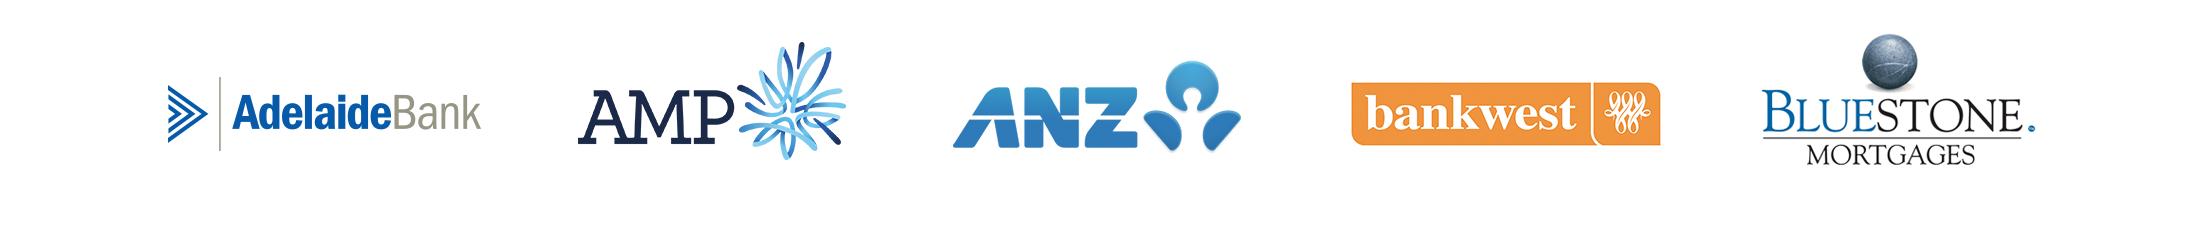 Adelaide Bank, AMP, ANZ, Bankwest, Bluestone Mortgages